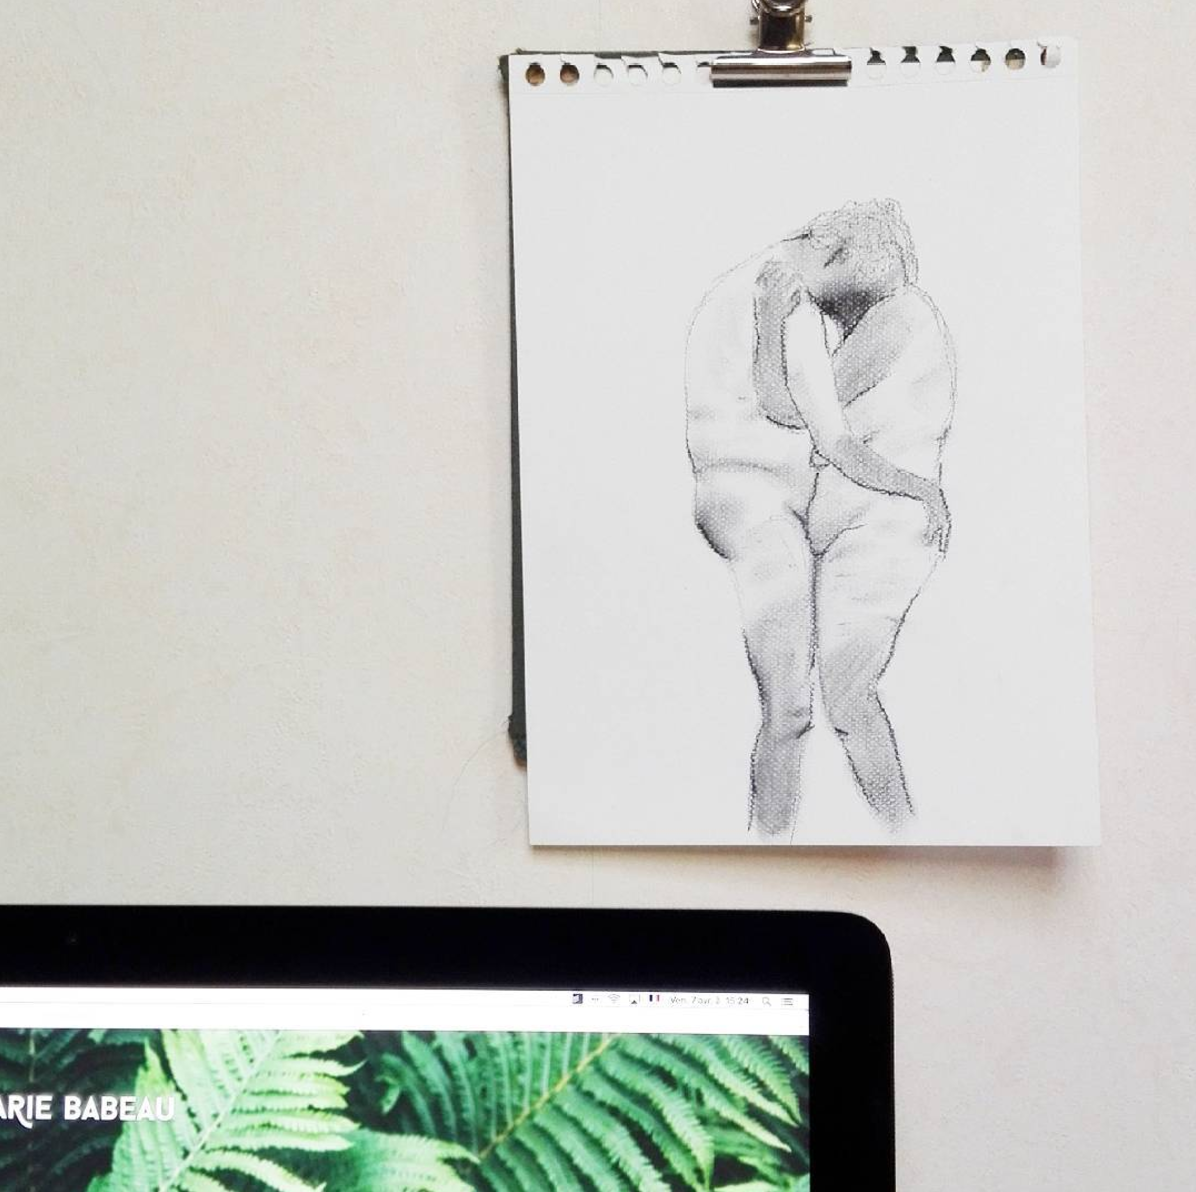 mariebabeau-graphiste-strasbourg-poitiers-freelance-indépendante-01